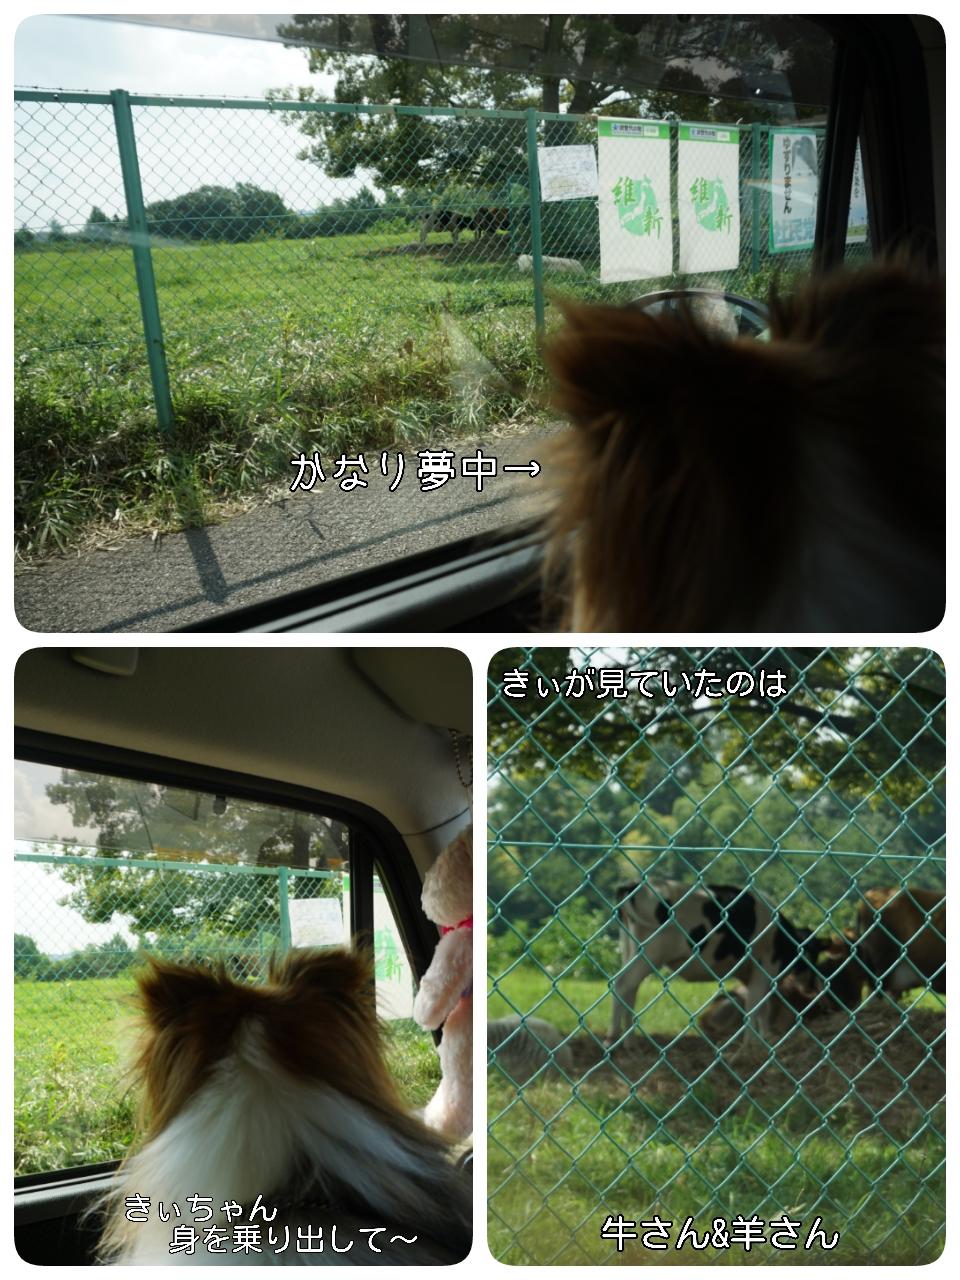 2015-08-15-15-03-17_deco.jpg